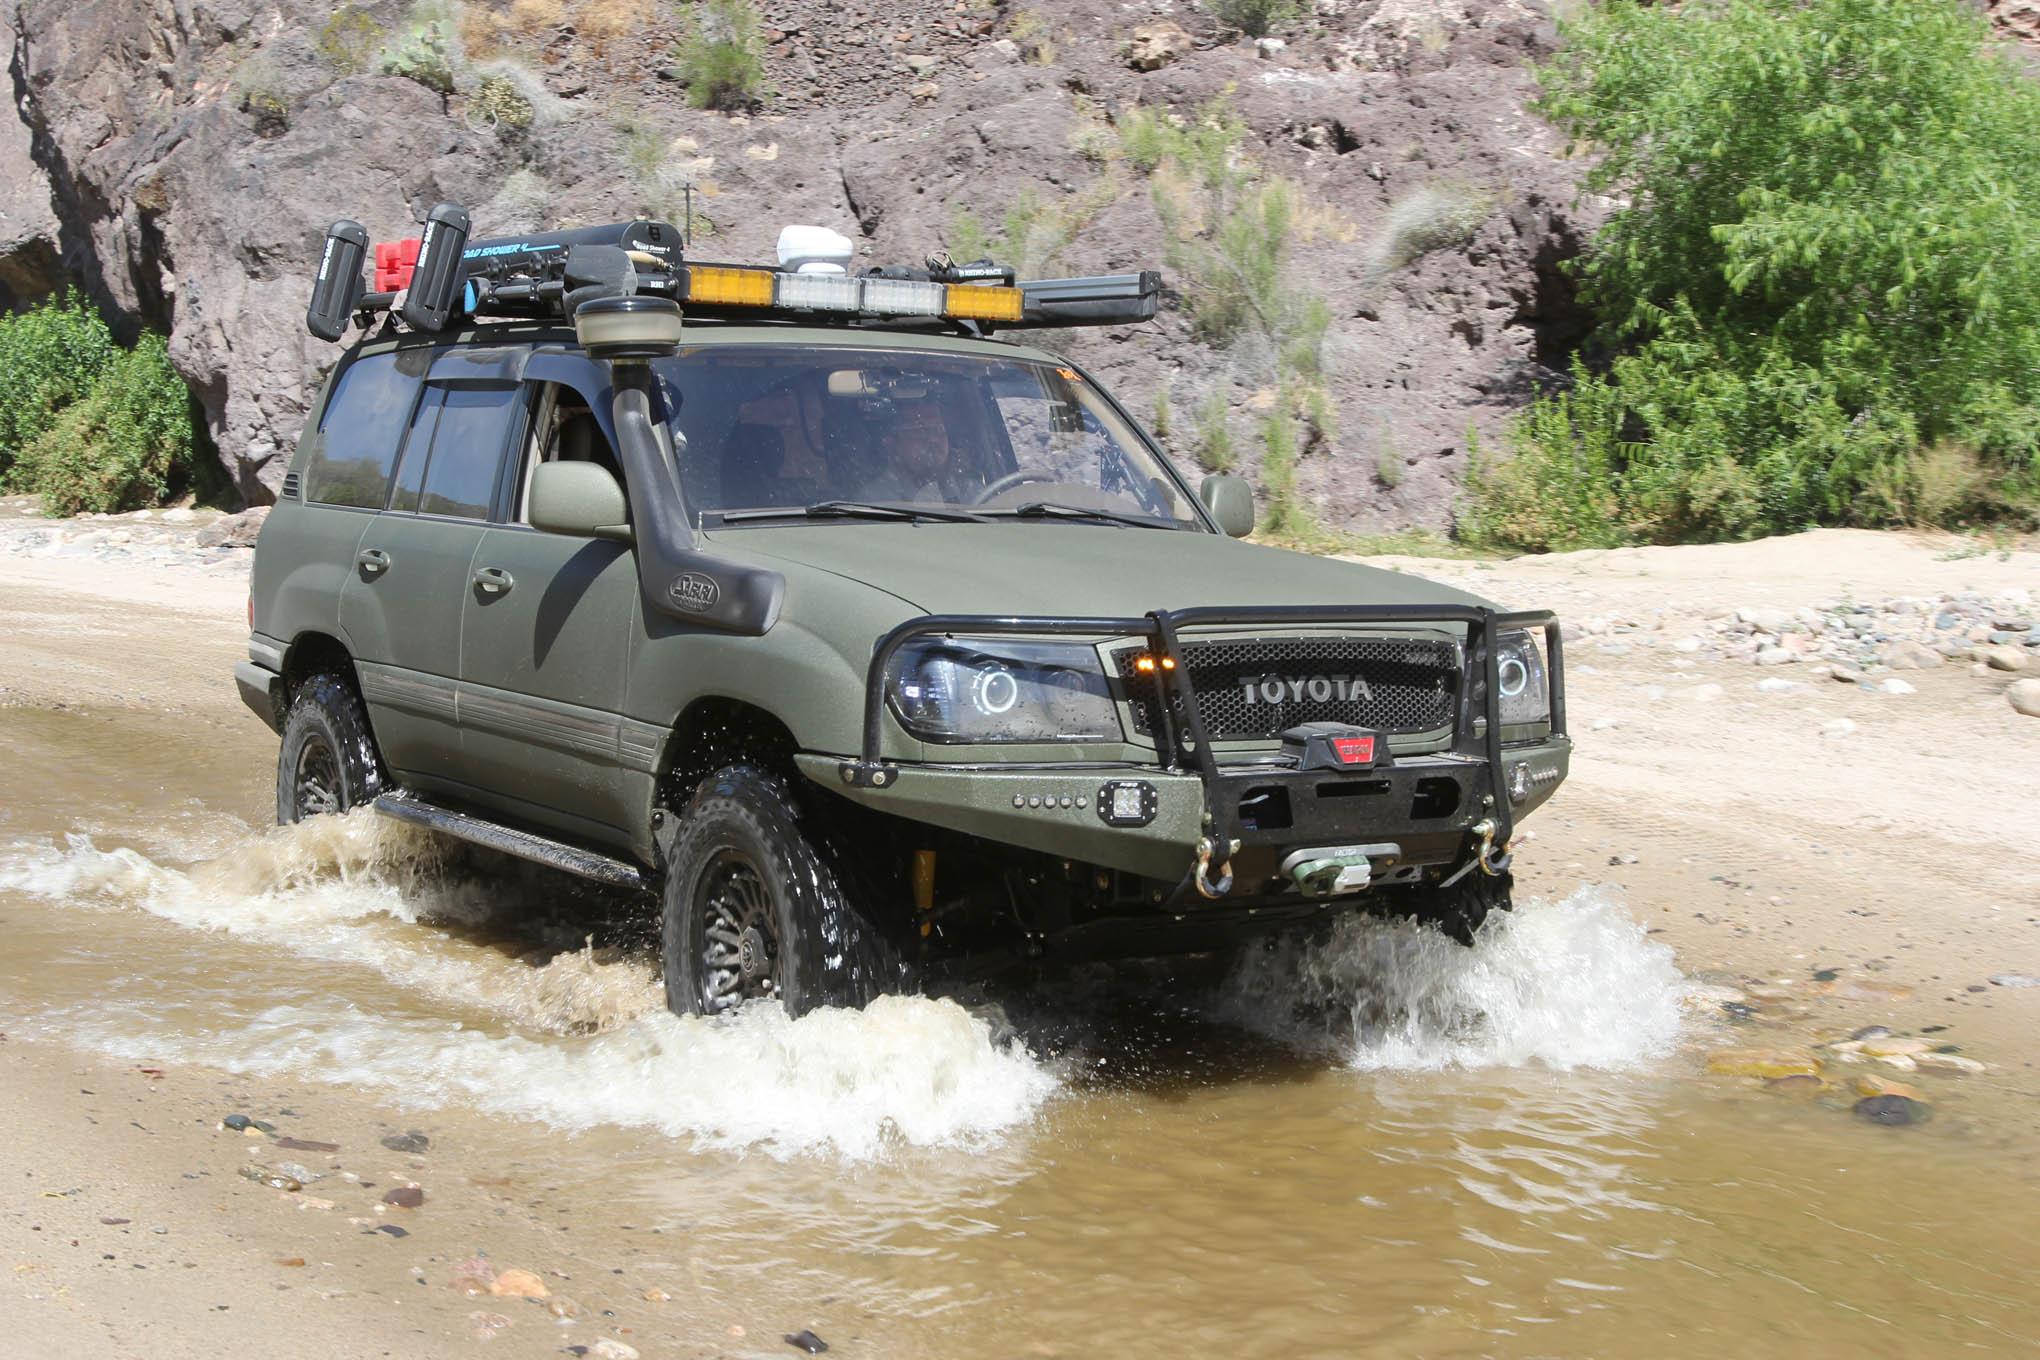 Kelebihan Toyota Land Cruiser 1999 Murah Berkualitas